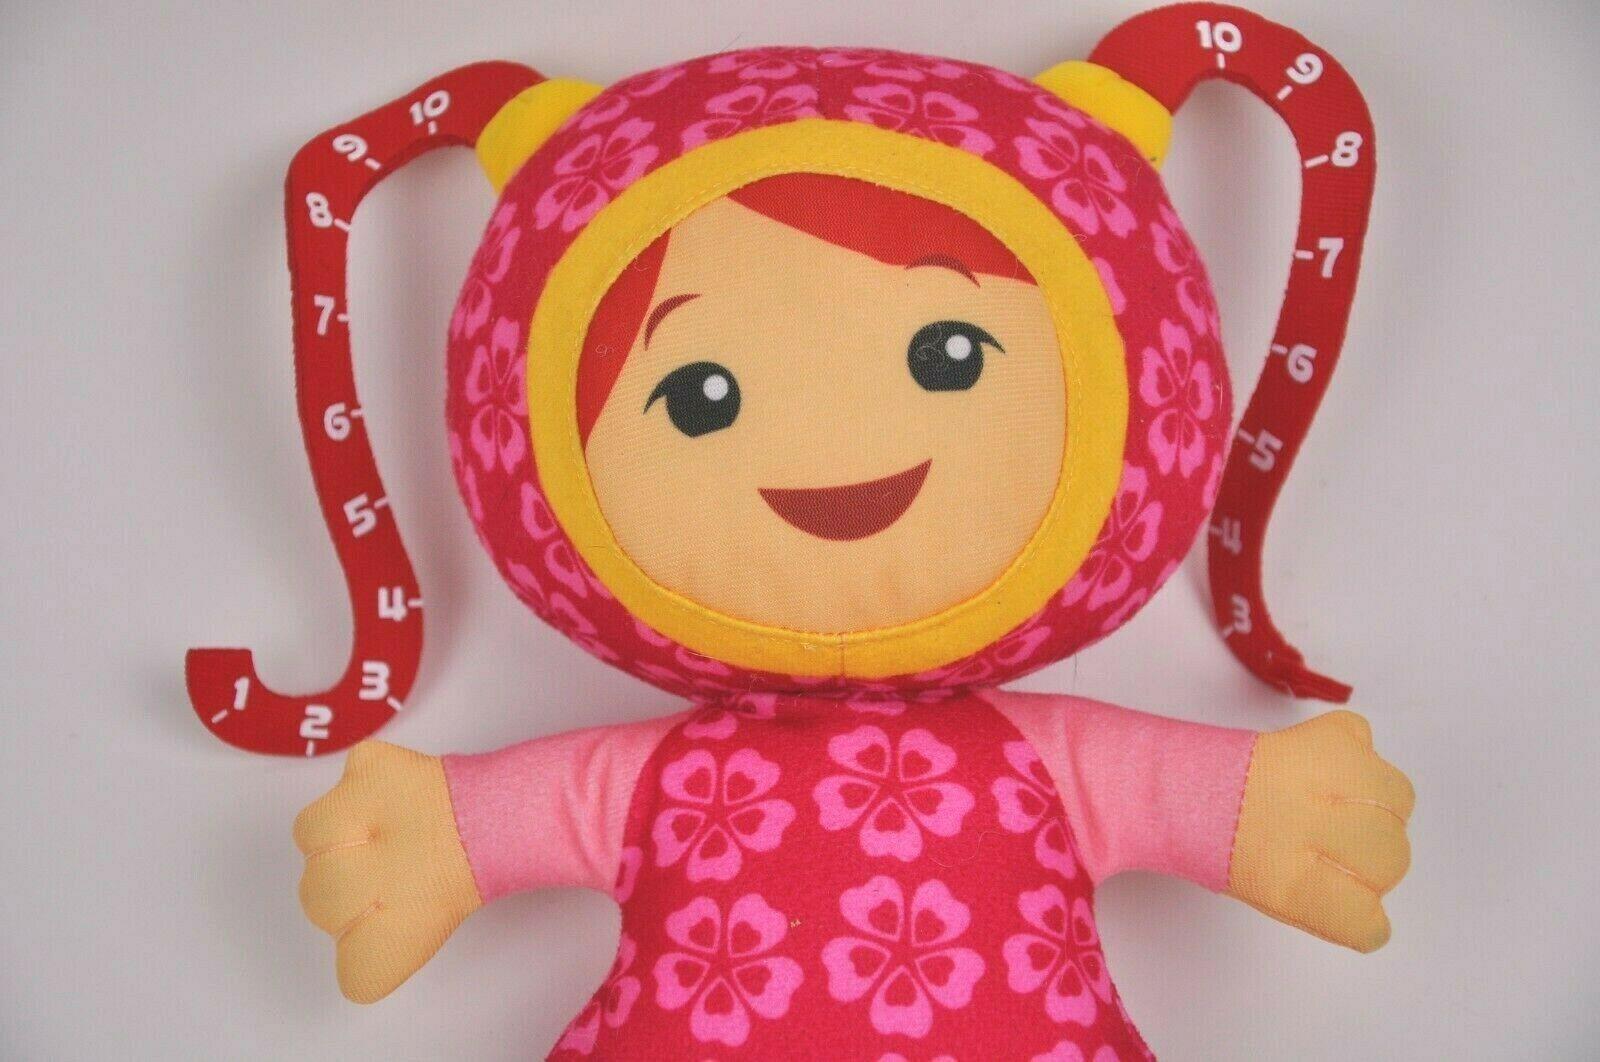 12 Fisher Price Team Umizoomi Milli Stuffed Plush Toy New